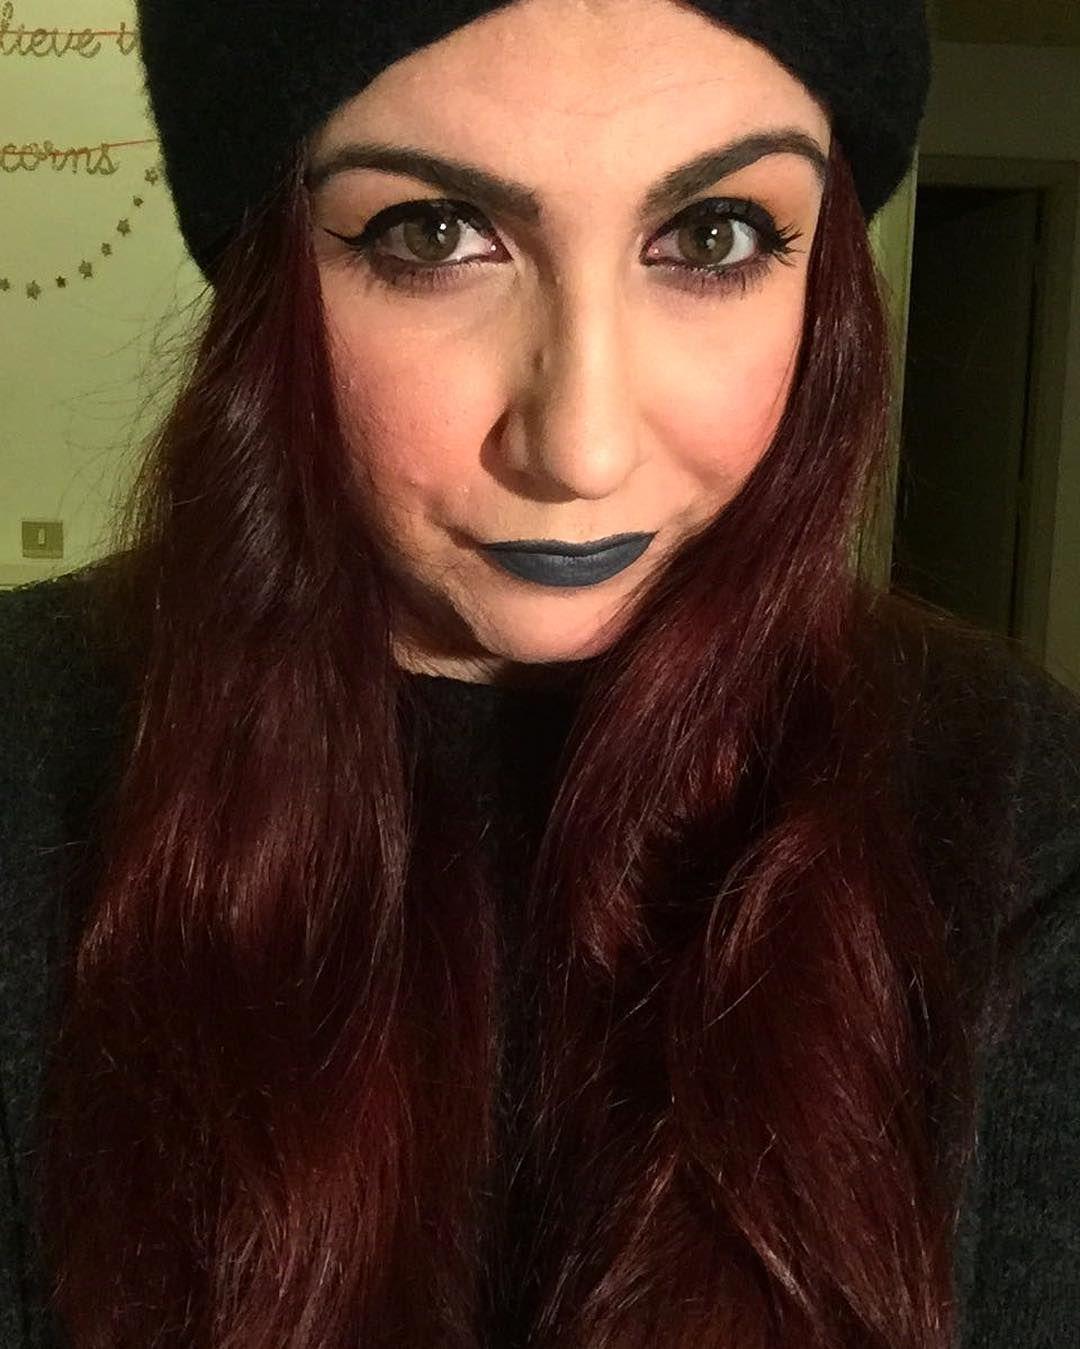 But I'm a creep I'm a weirdo ft @kikomilano Velvet Passion lipstick nr 324 Slate Grey  #consiglidimakeup #kikotrendsetter #kikomilano #kikocosmetics #grey #lipstick #selfie #redhairdontcare